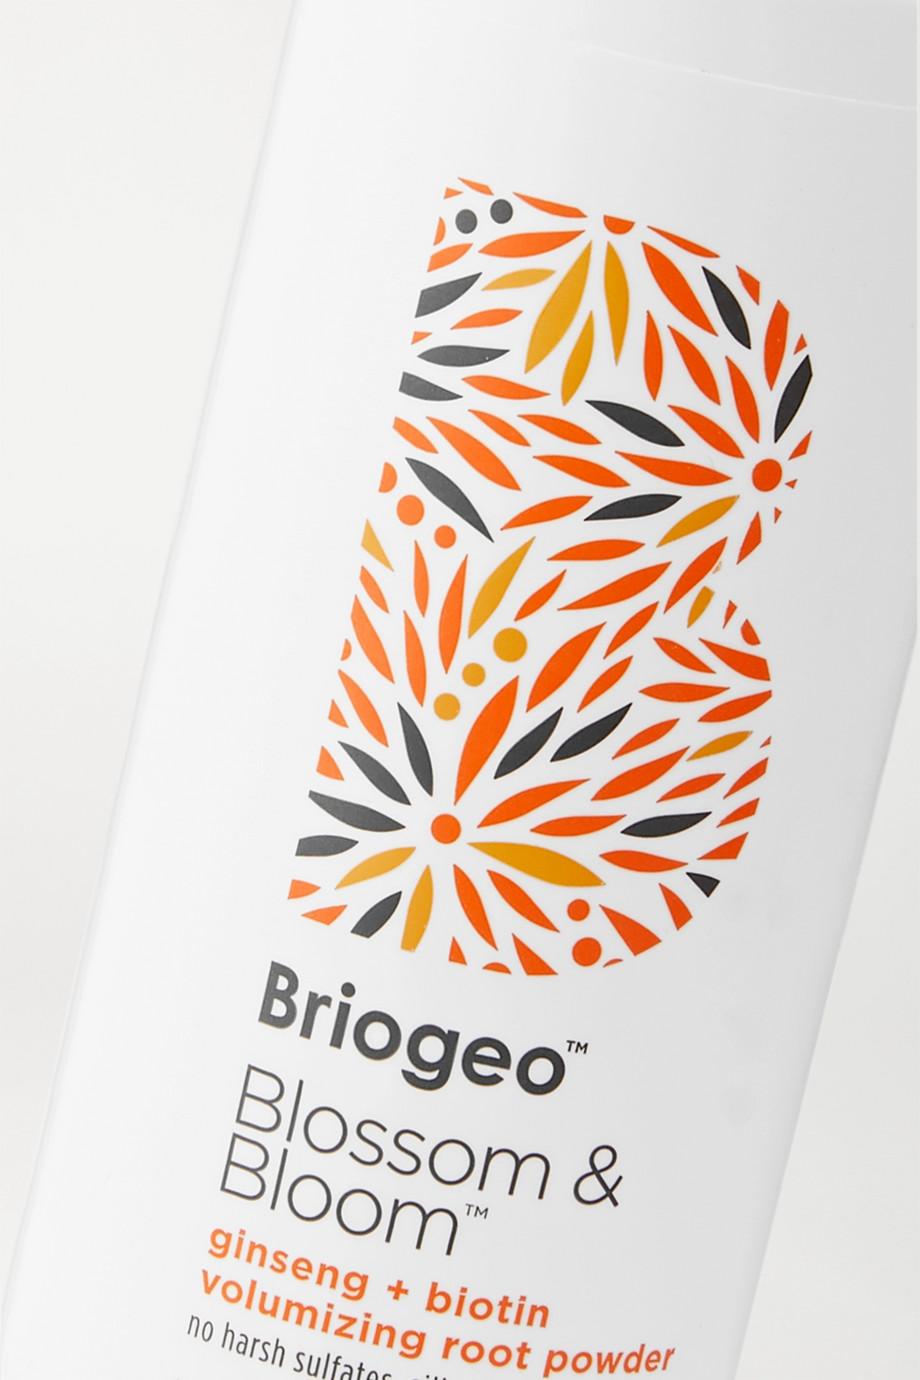 Briogeo Blossom & Bloom Ginseng + Biotin Volumizing Root Powder, 35g